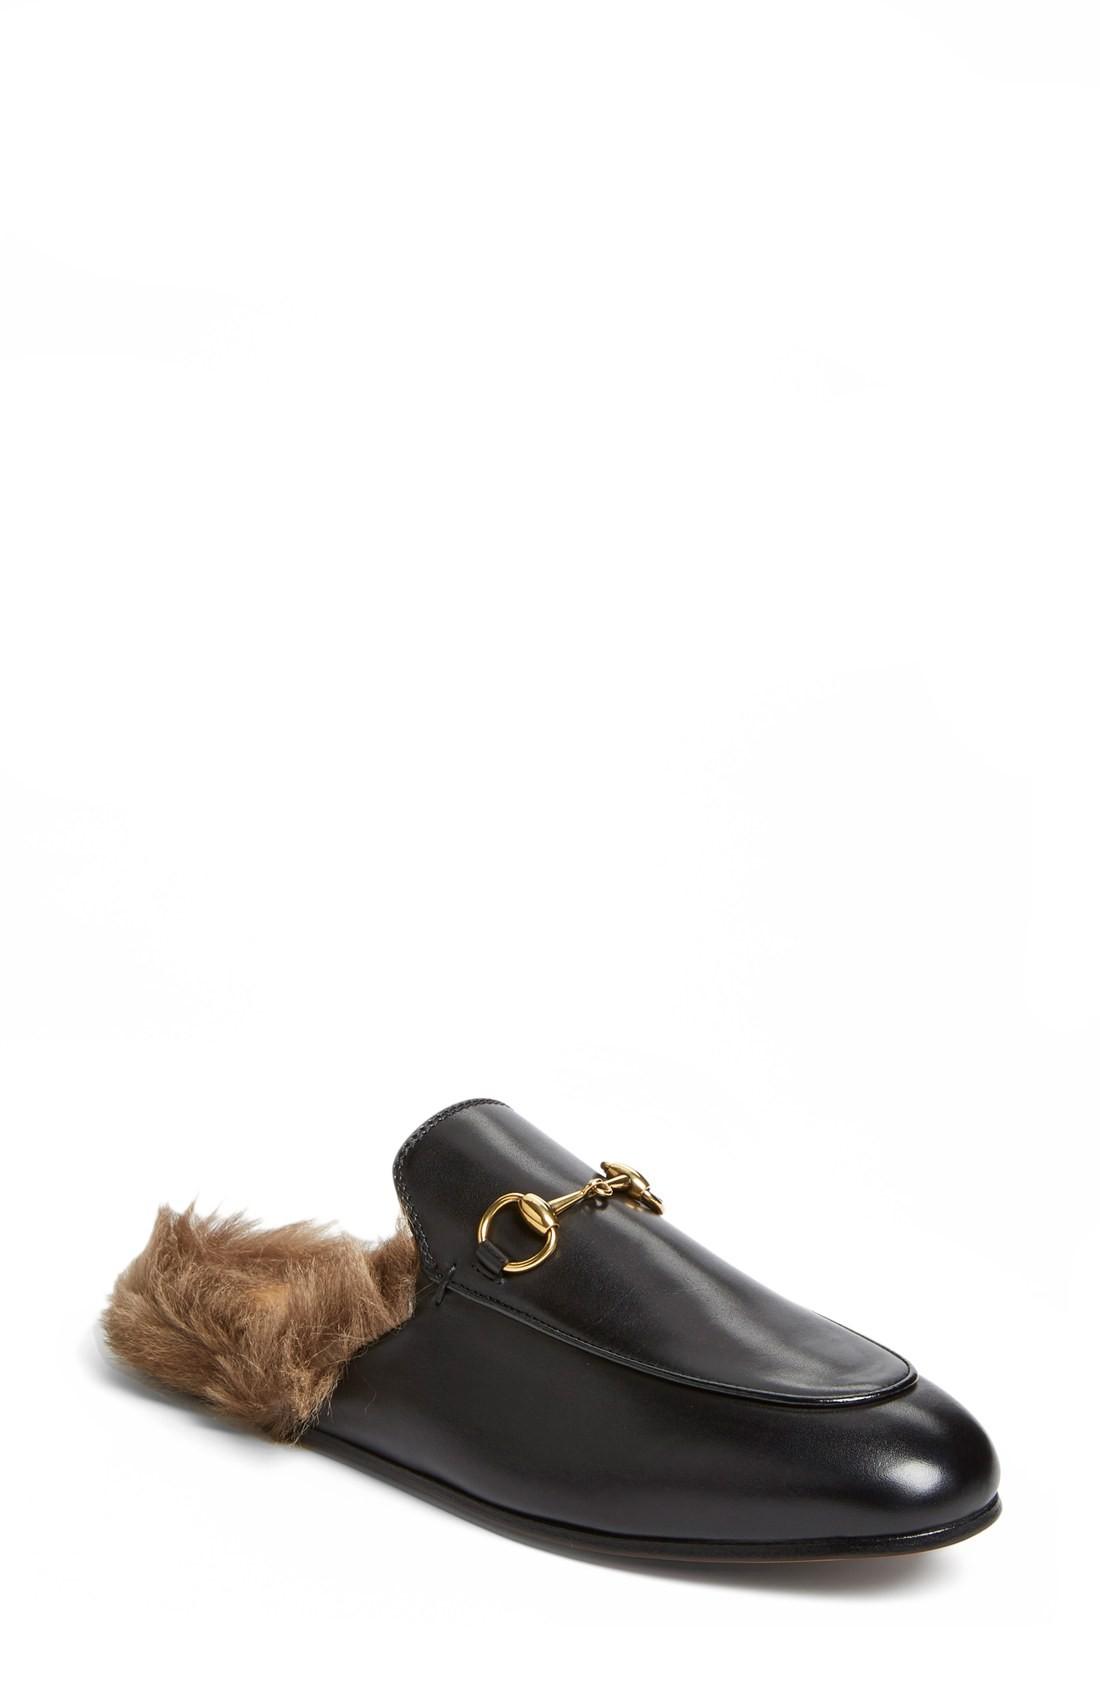 womens loafers gucci princetown genuine shearling loafer mule (women) lrmjcmp